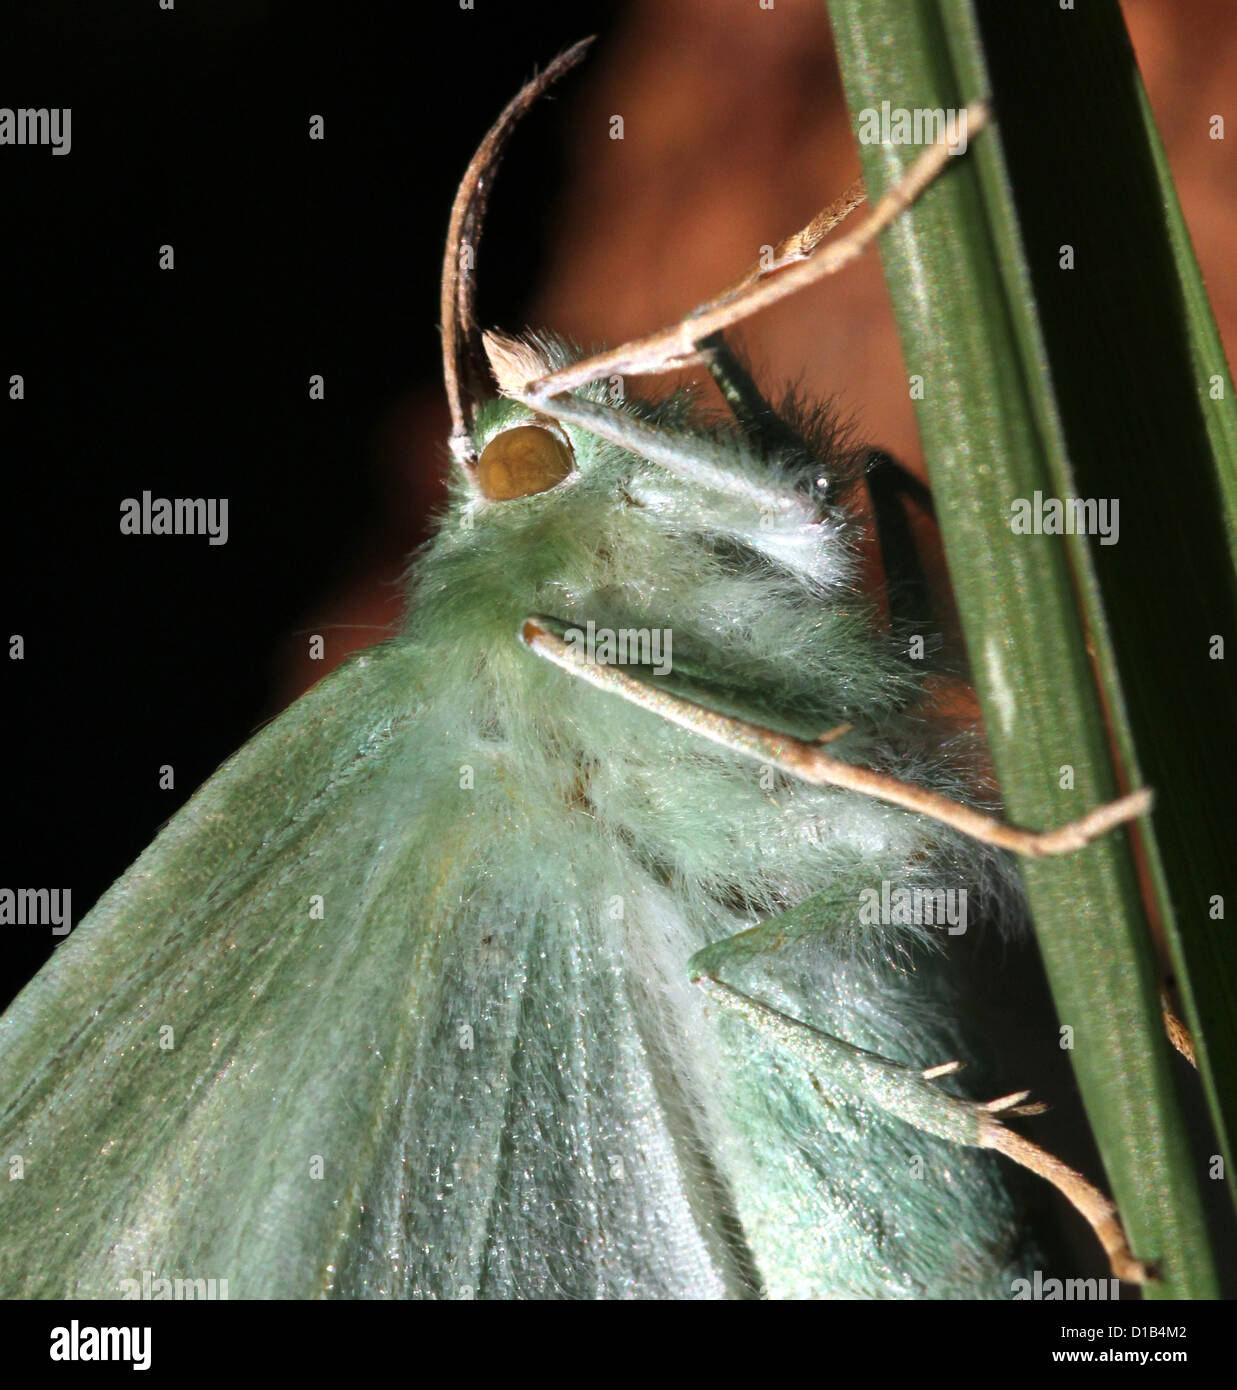 Extrem detaillierte Makro Bild eines großen Smaragd Schmetterlings (Geometra Papilionaria) Stockbild